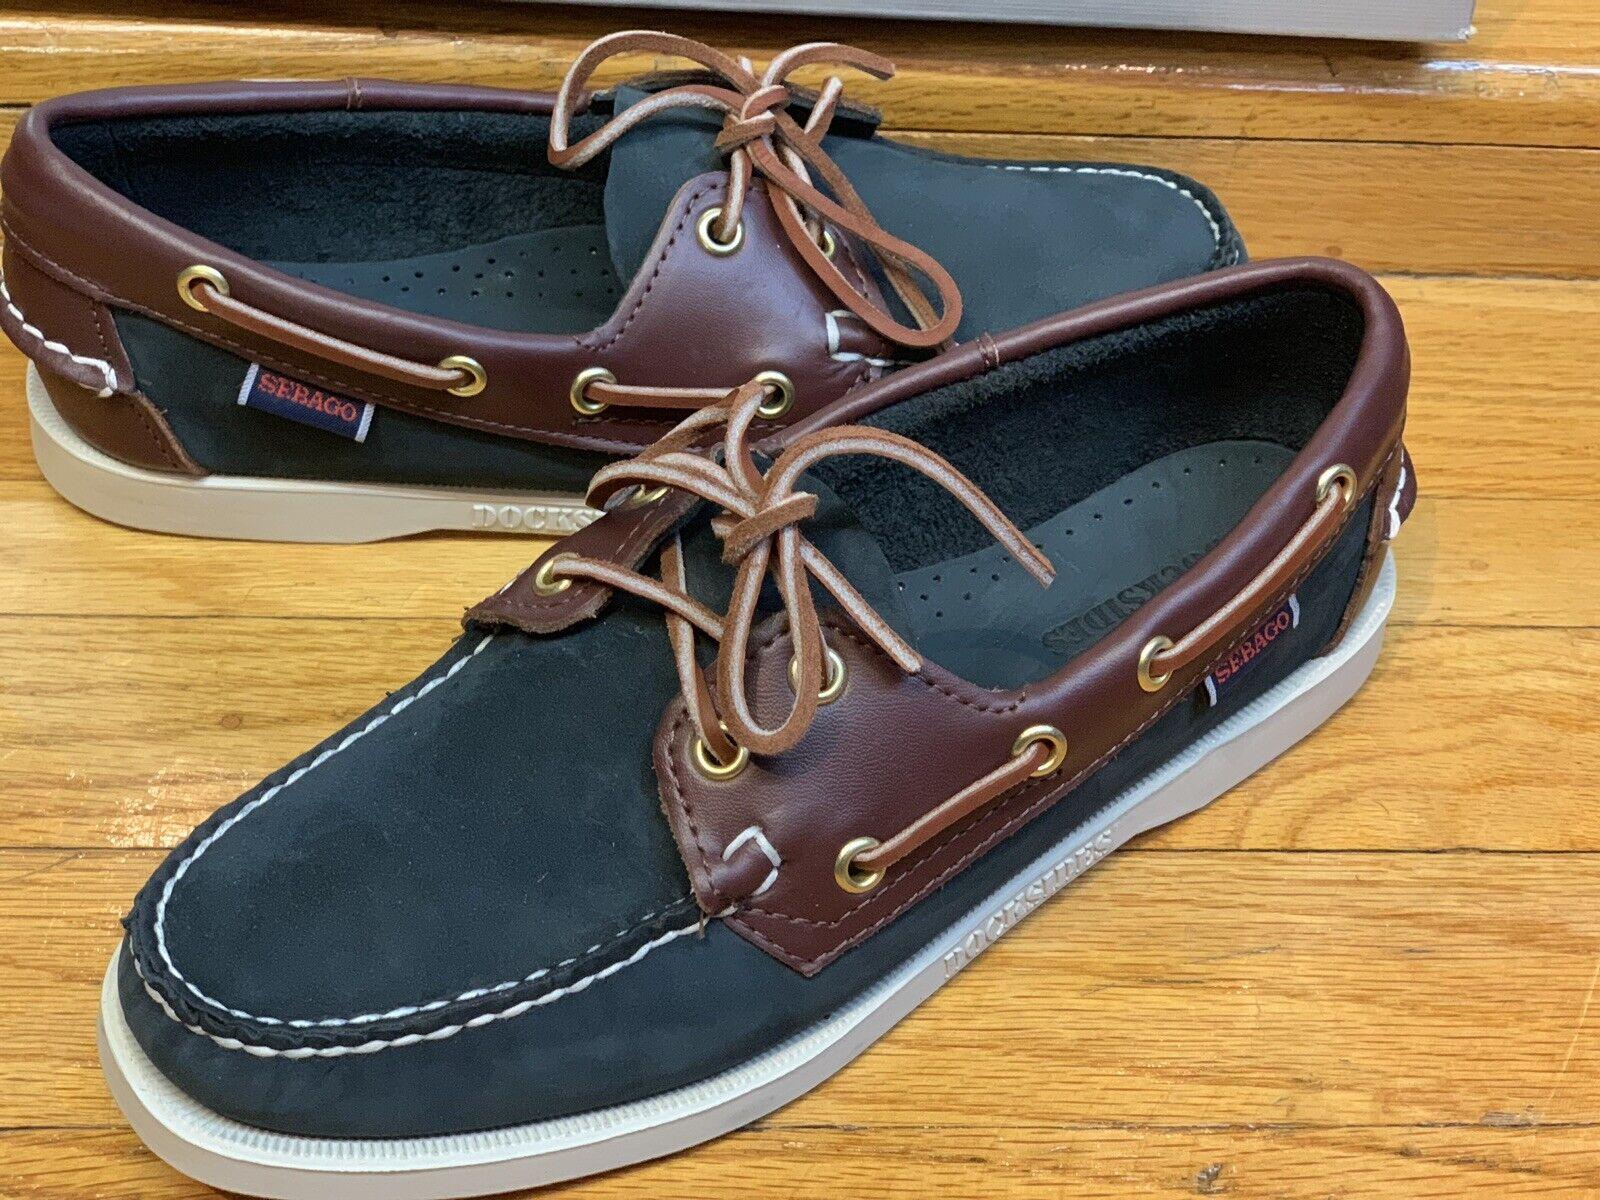 Women's Sebago Docksides Spinnaker shoes bluee Brown Brown Brown B58152 914e7b